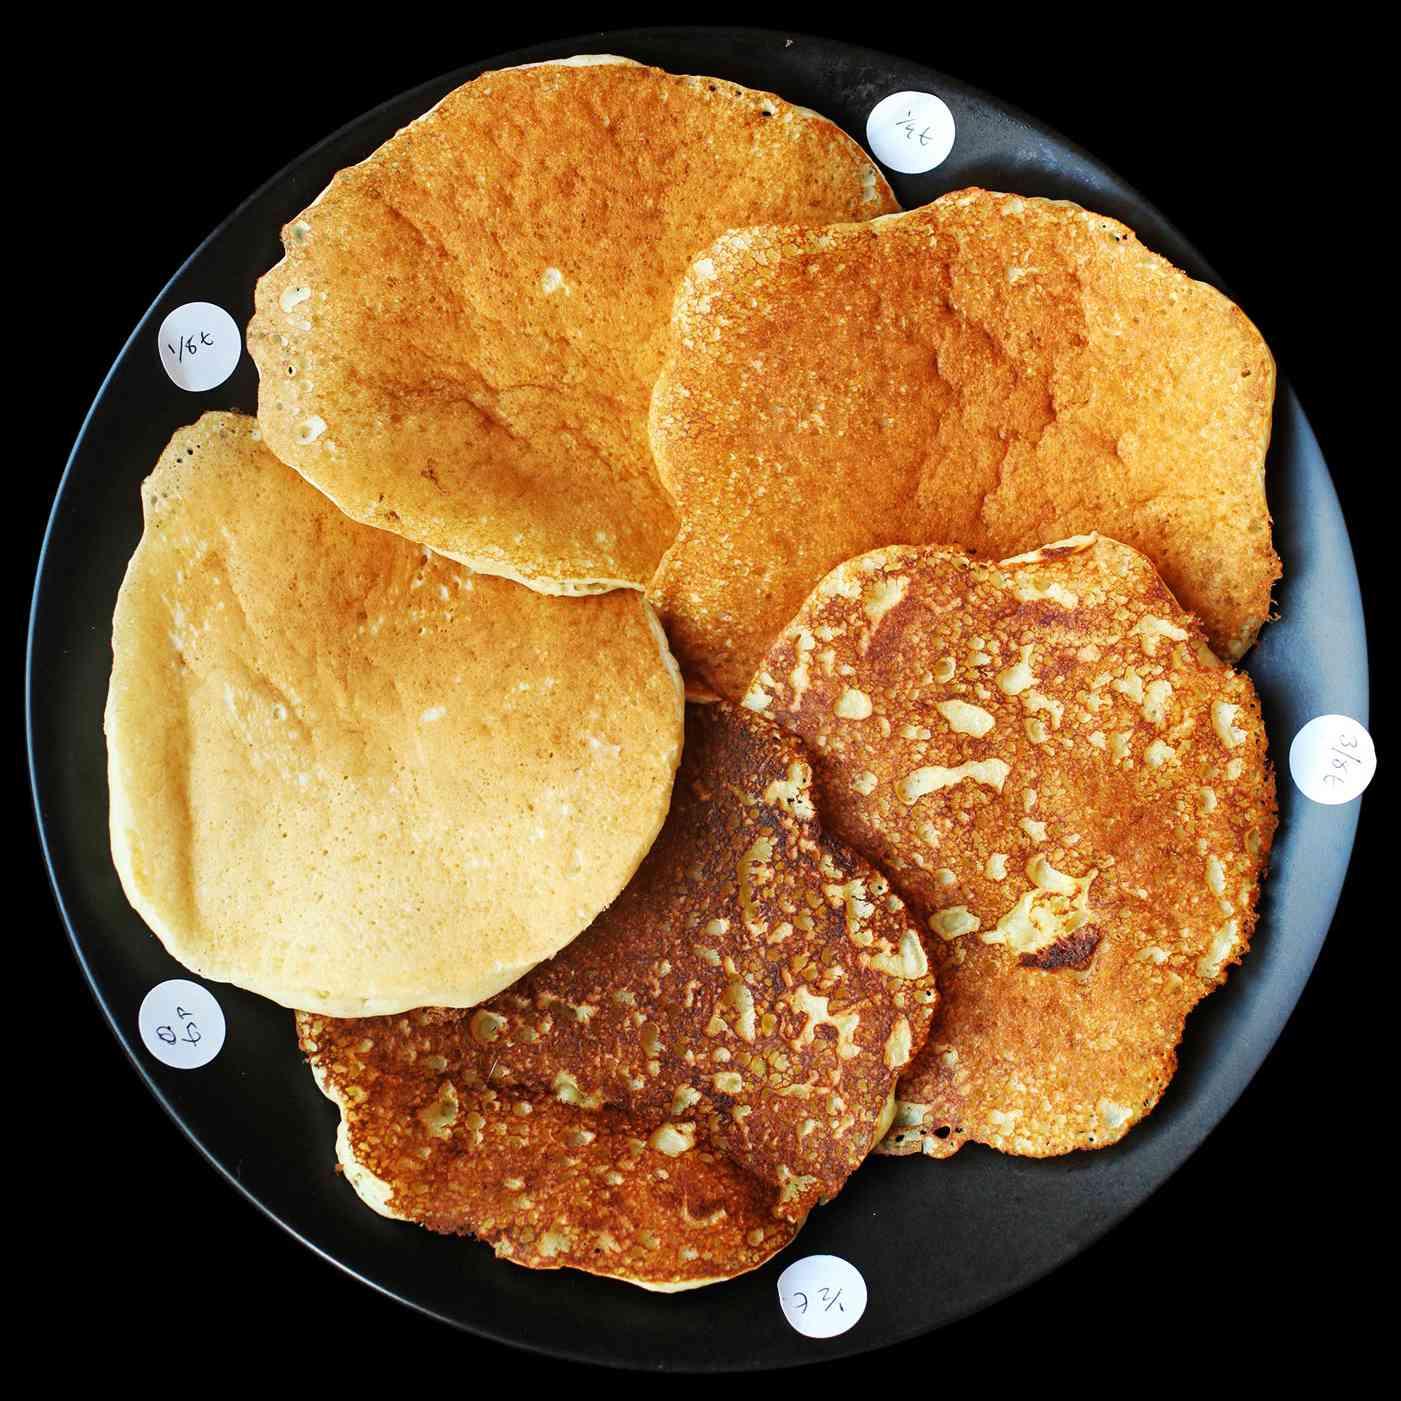 20150518-pancakes-new-kenji-01.jpg